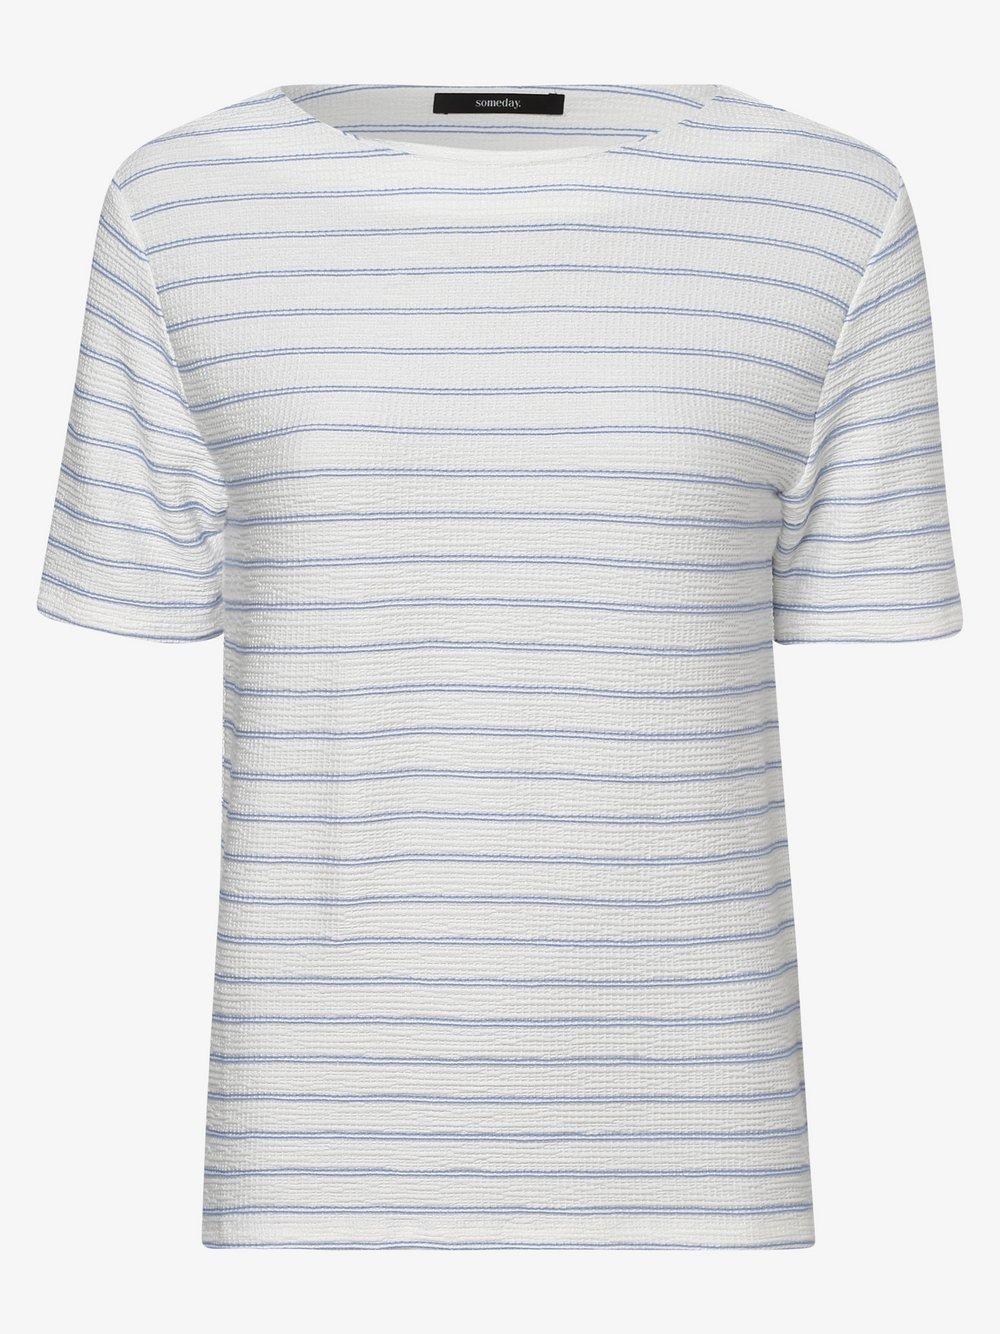 Someday - T-shirt damski, niebieski